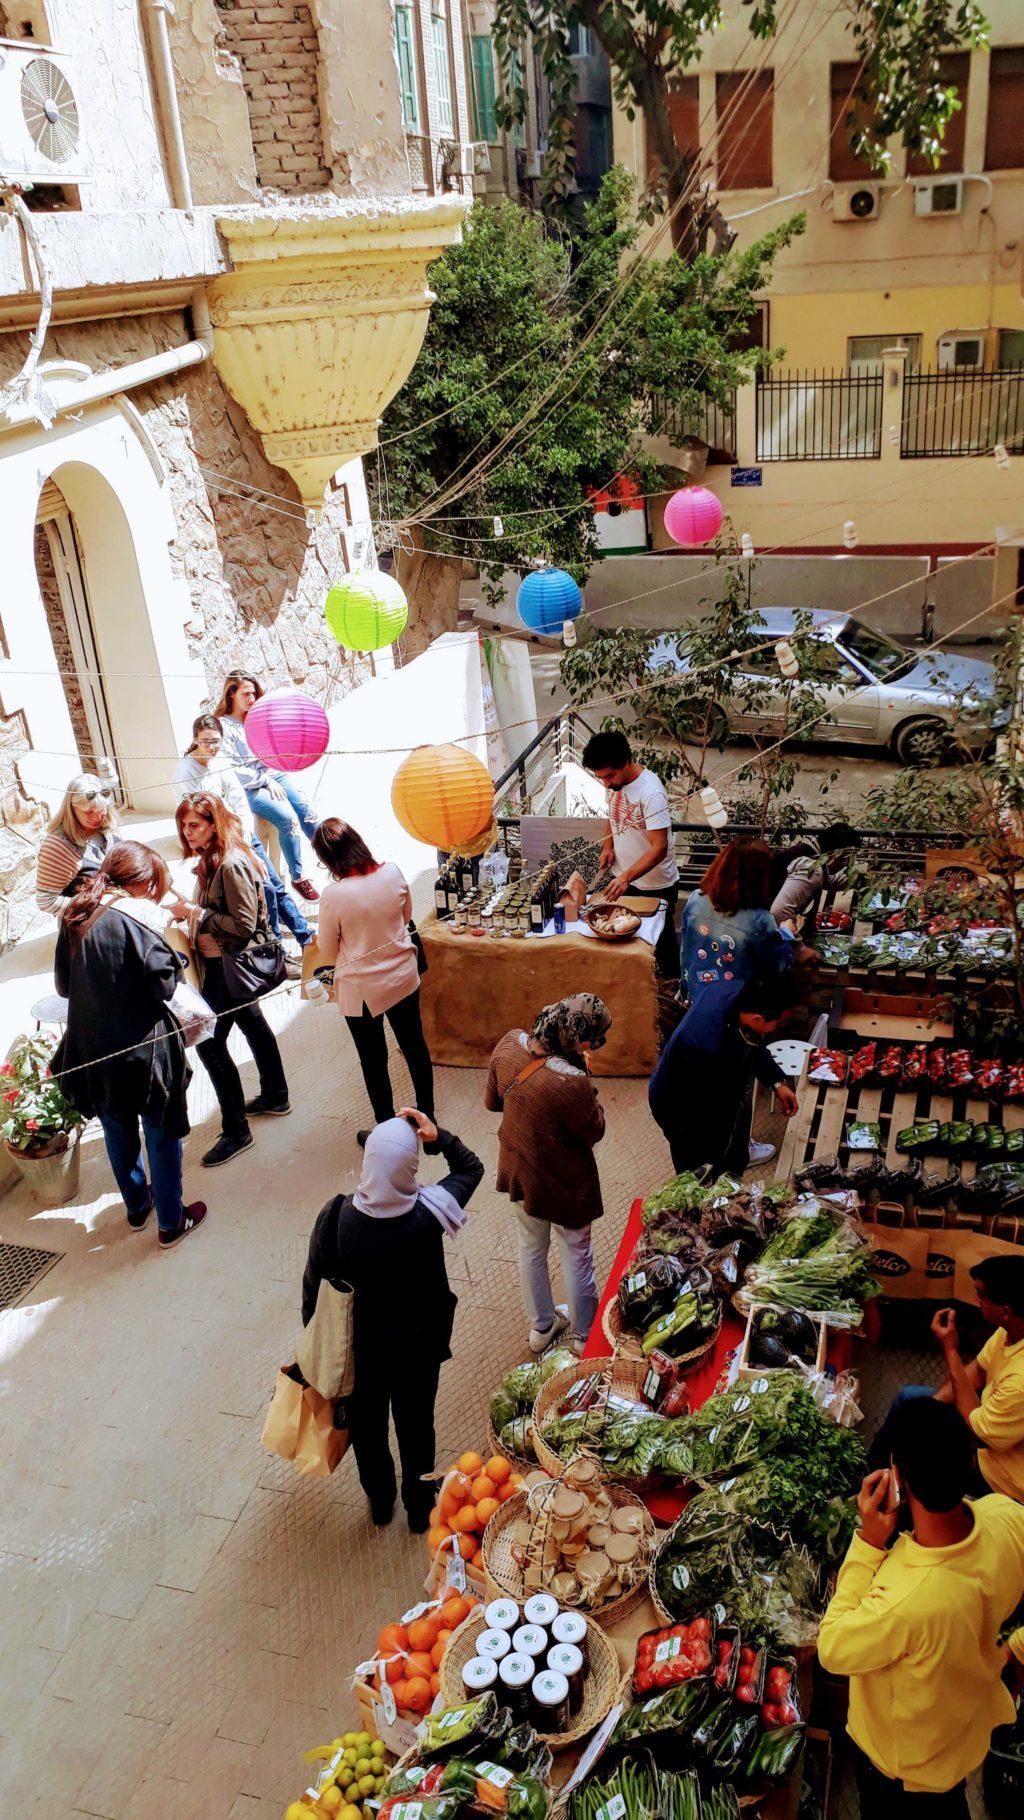 Pop-Up Market in Zamalek (every Saturday and Sunday)